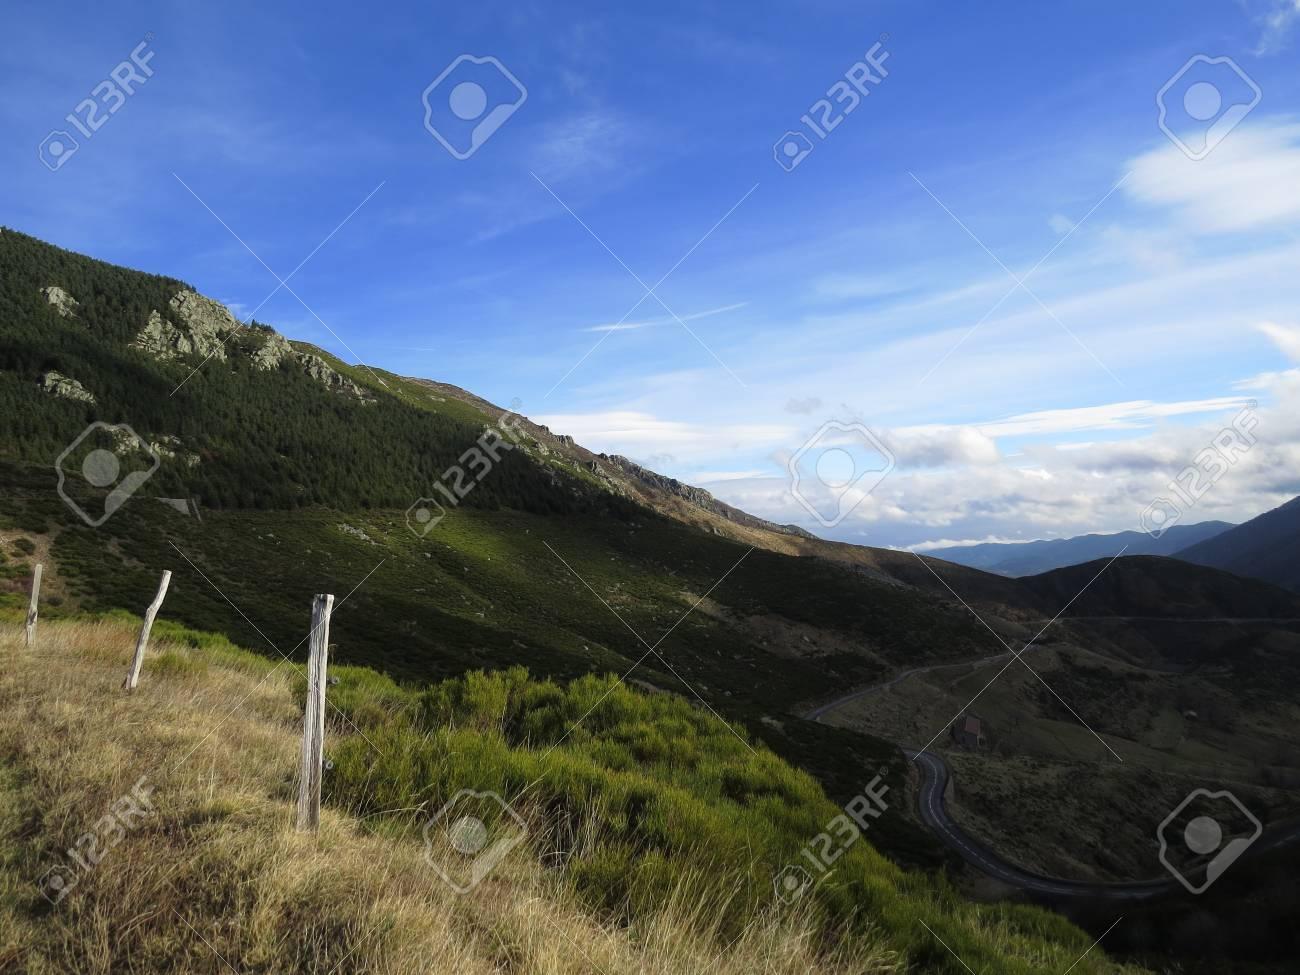 Panorama montagne ardechoise - 43392860